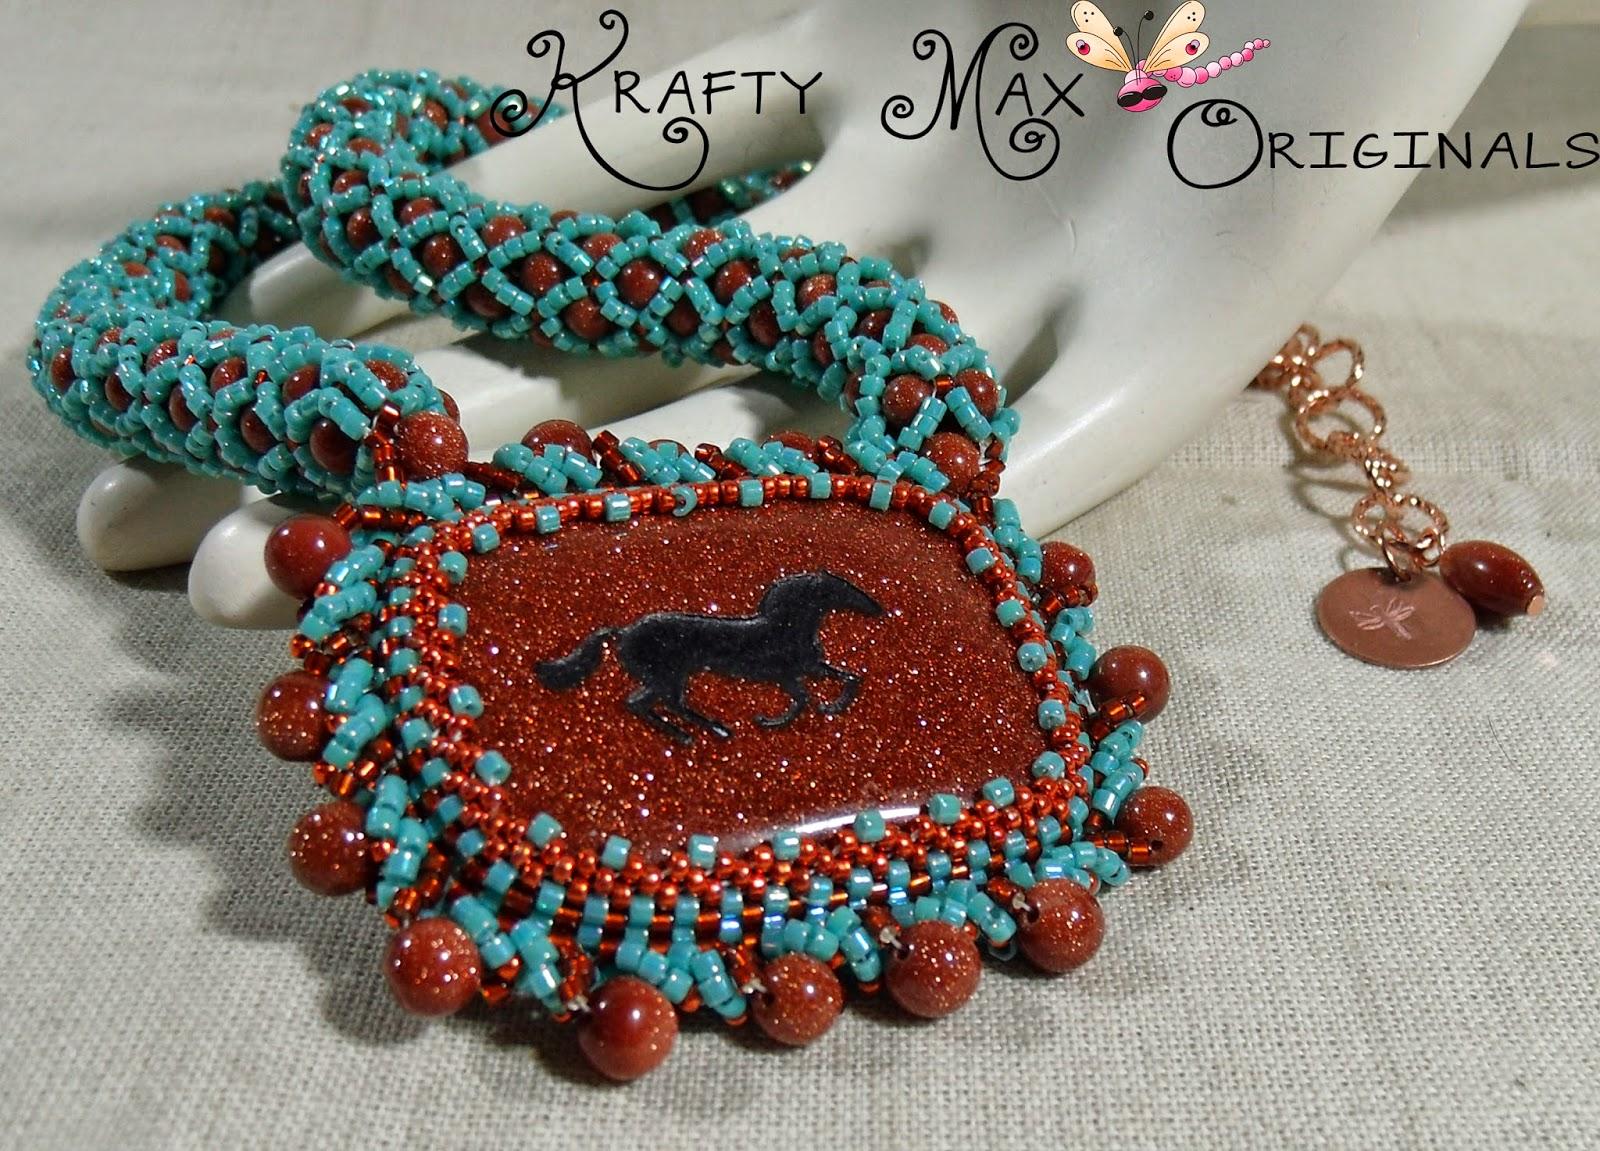 http://www.artfire.com/ext/shop/product_view/9055101#